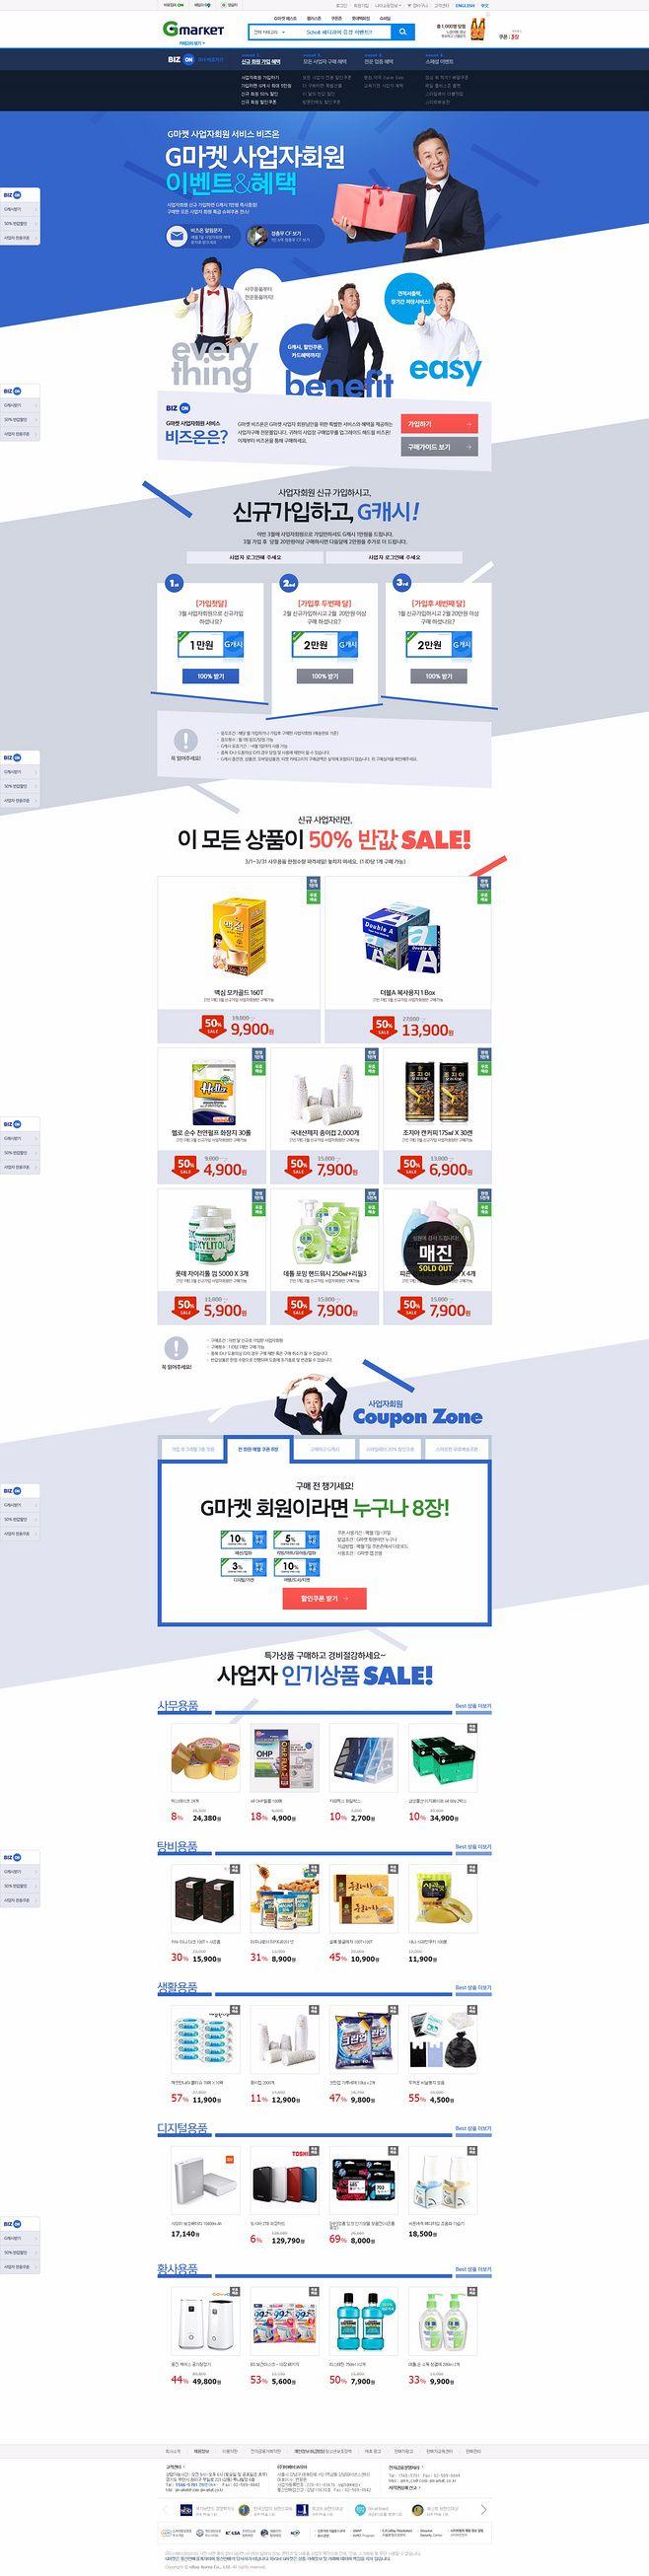 G마켓-사업자회원 가입&구매 혜택